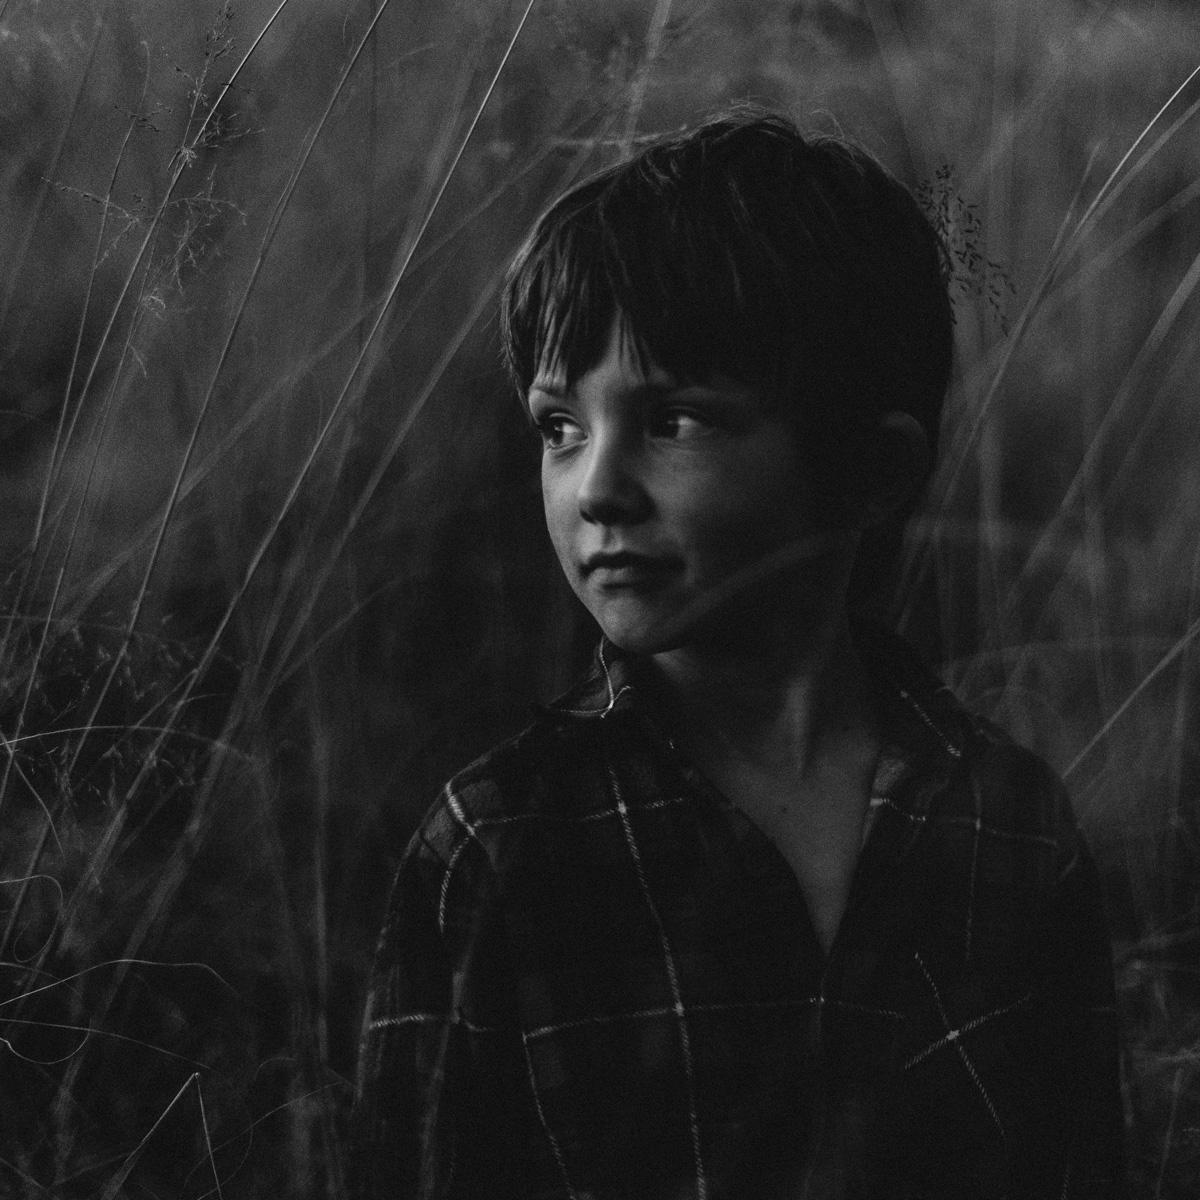 portraits-33.jpg